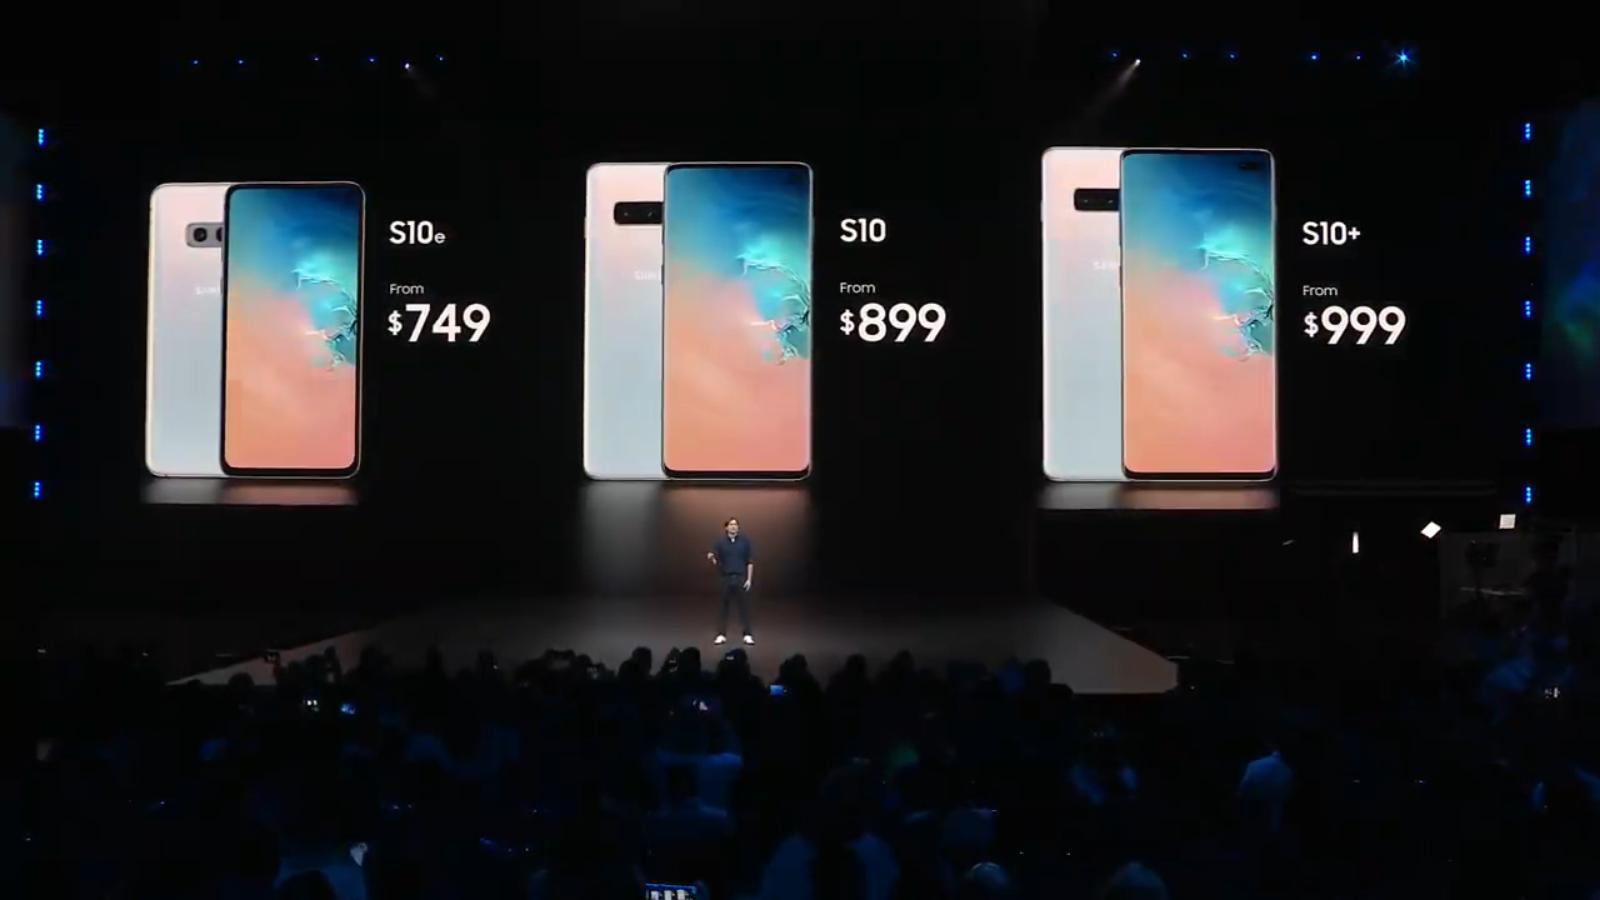 Galaxy S10 pricing